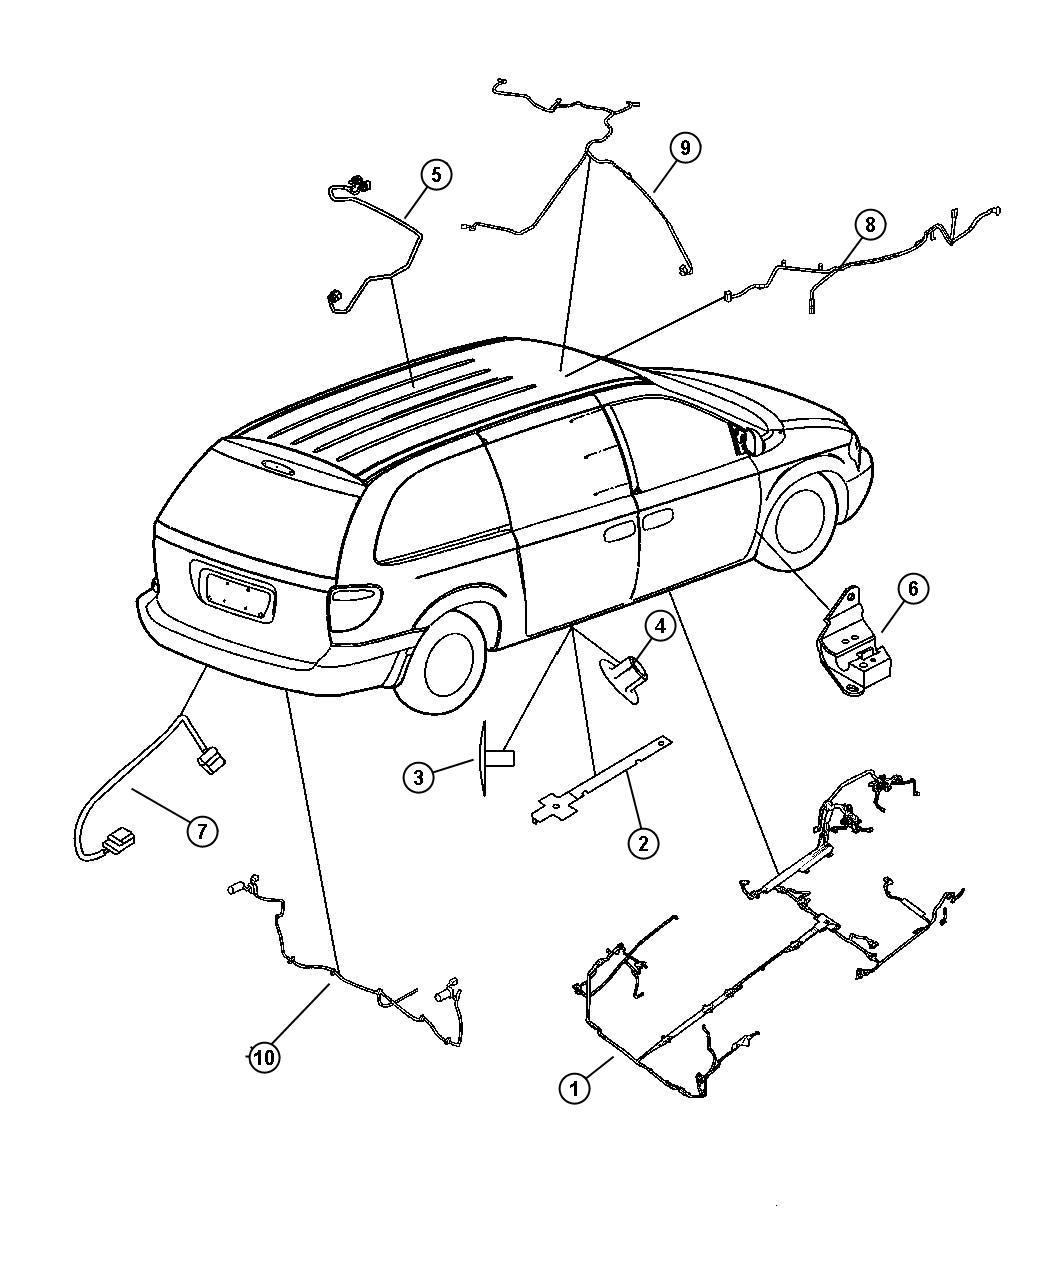 Dodge Caravan Wiring. Unified body. [anti-lock brakes